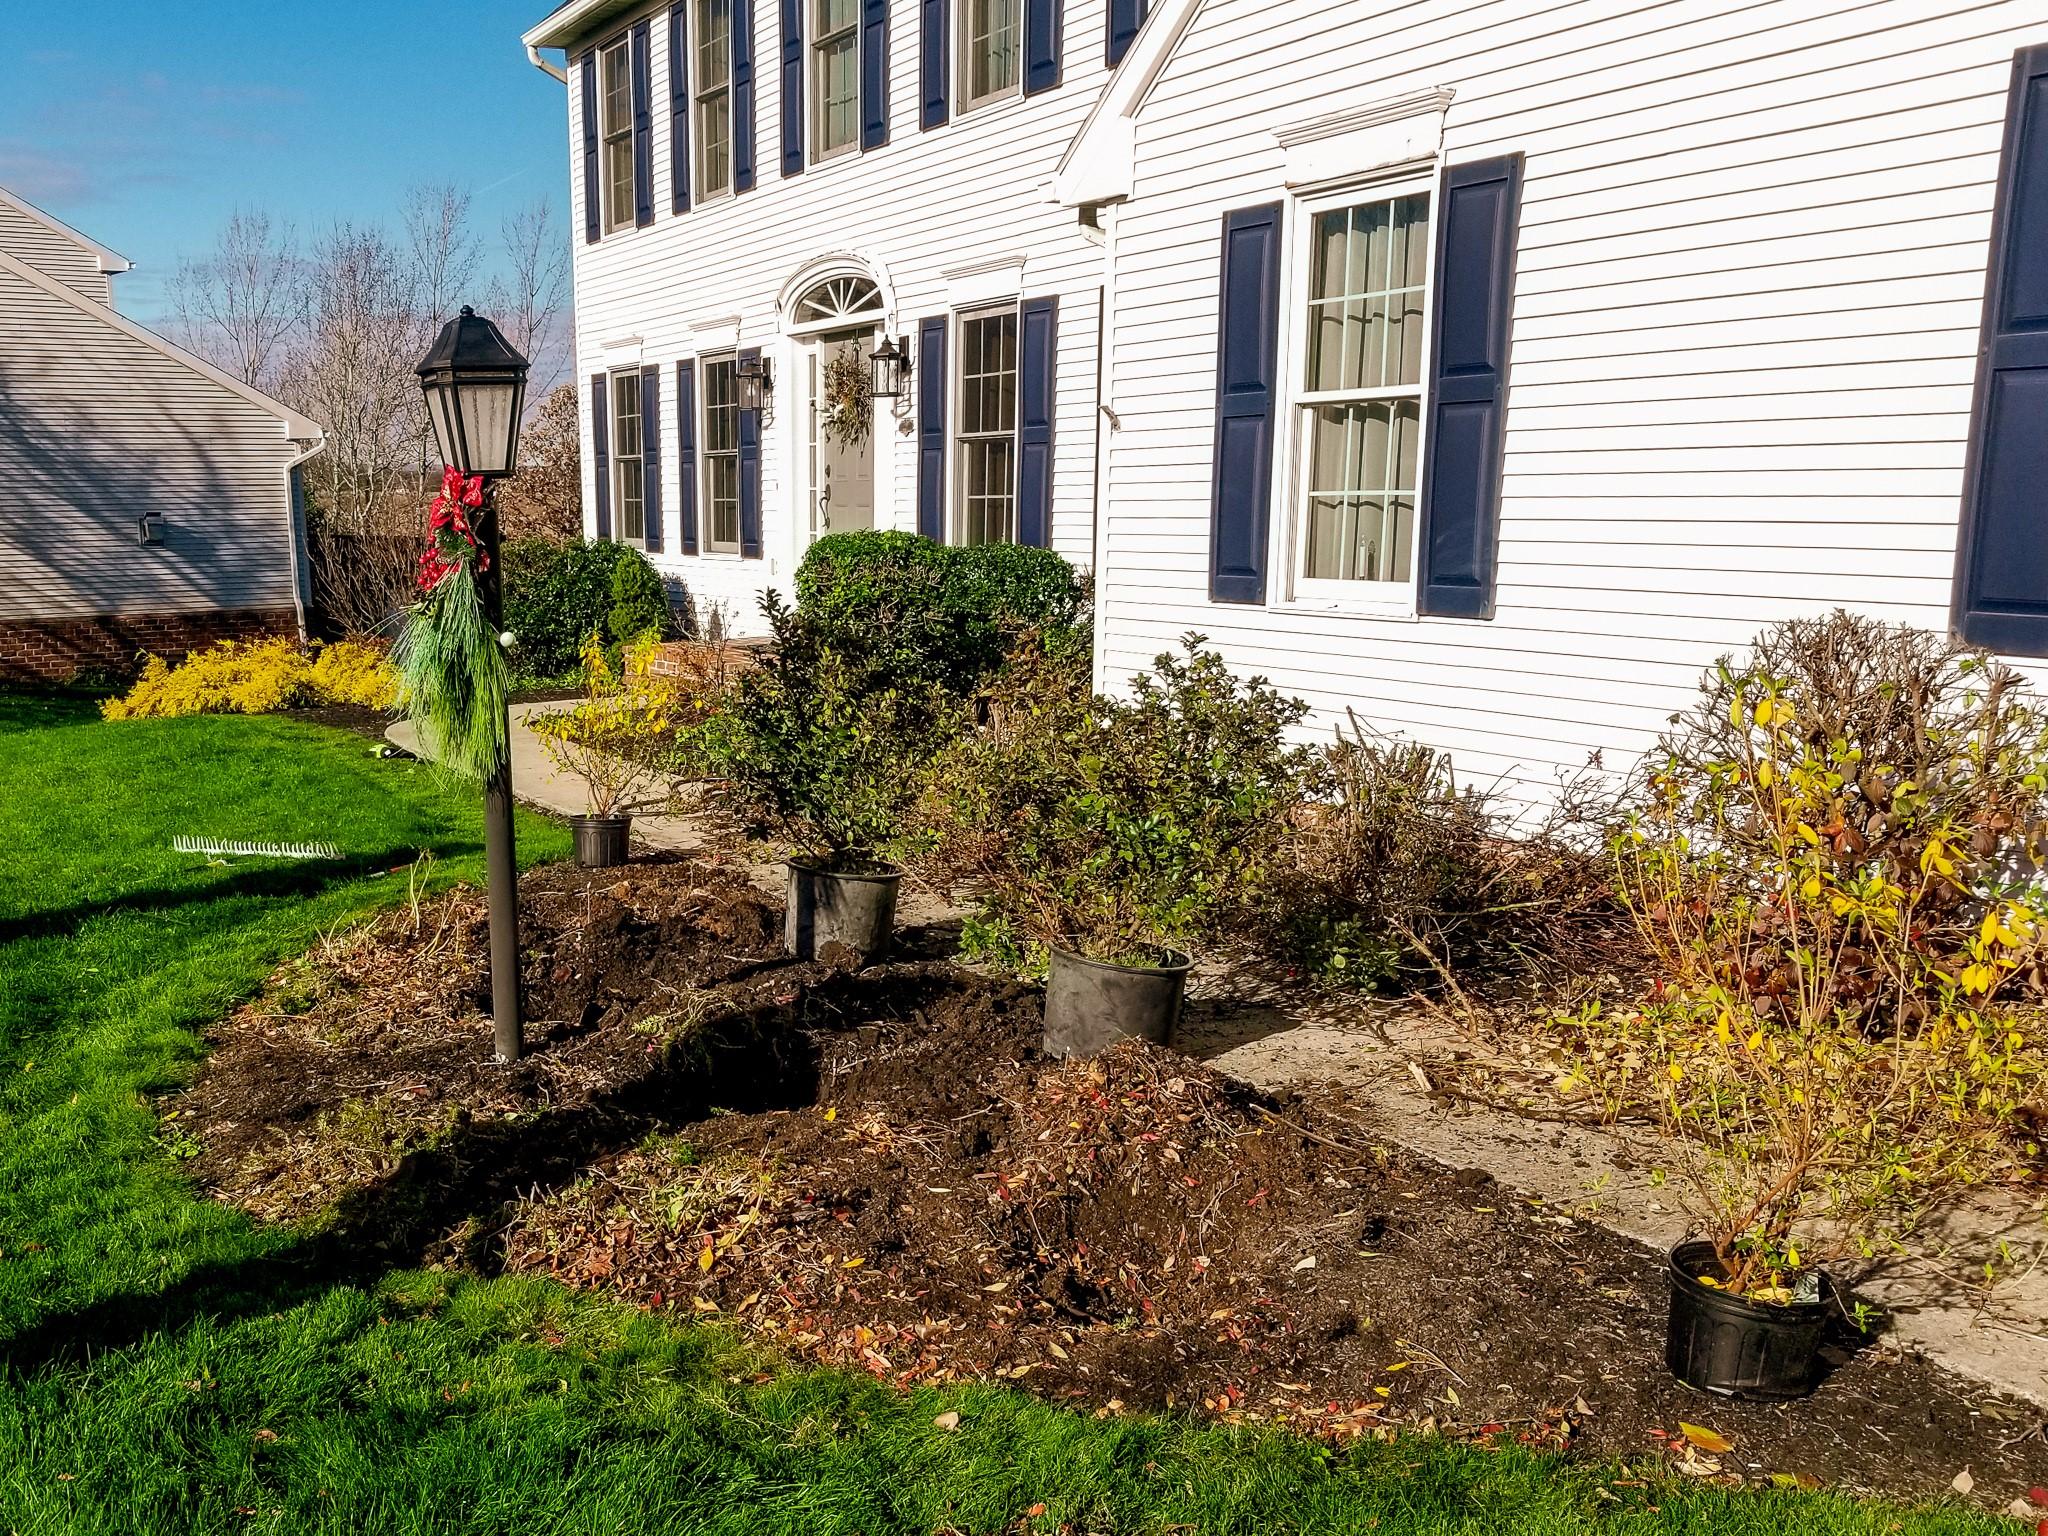 Blog - Cutting Edge Tree Professionals - Winter Planting